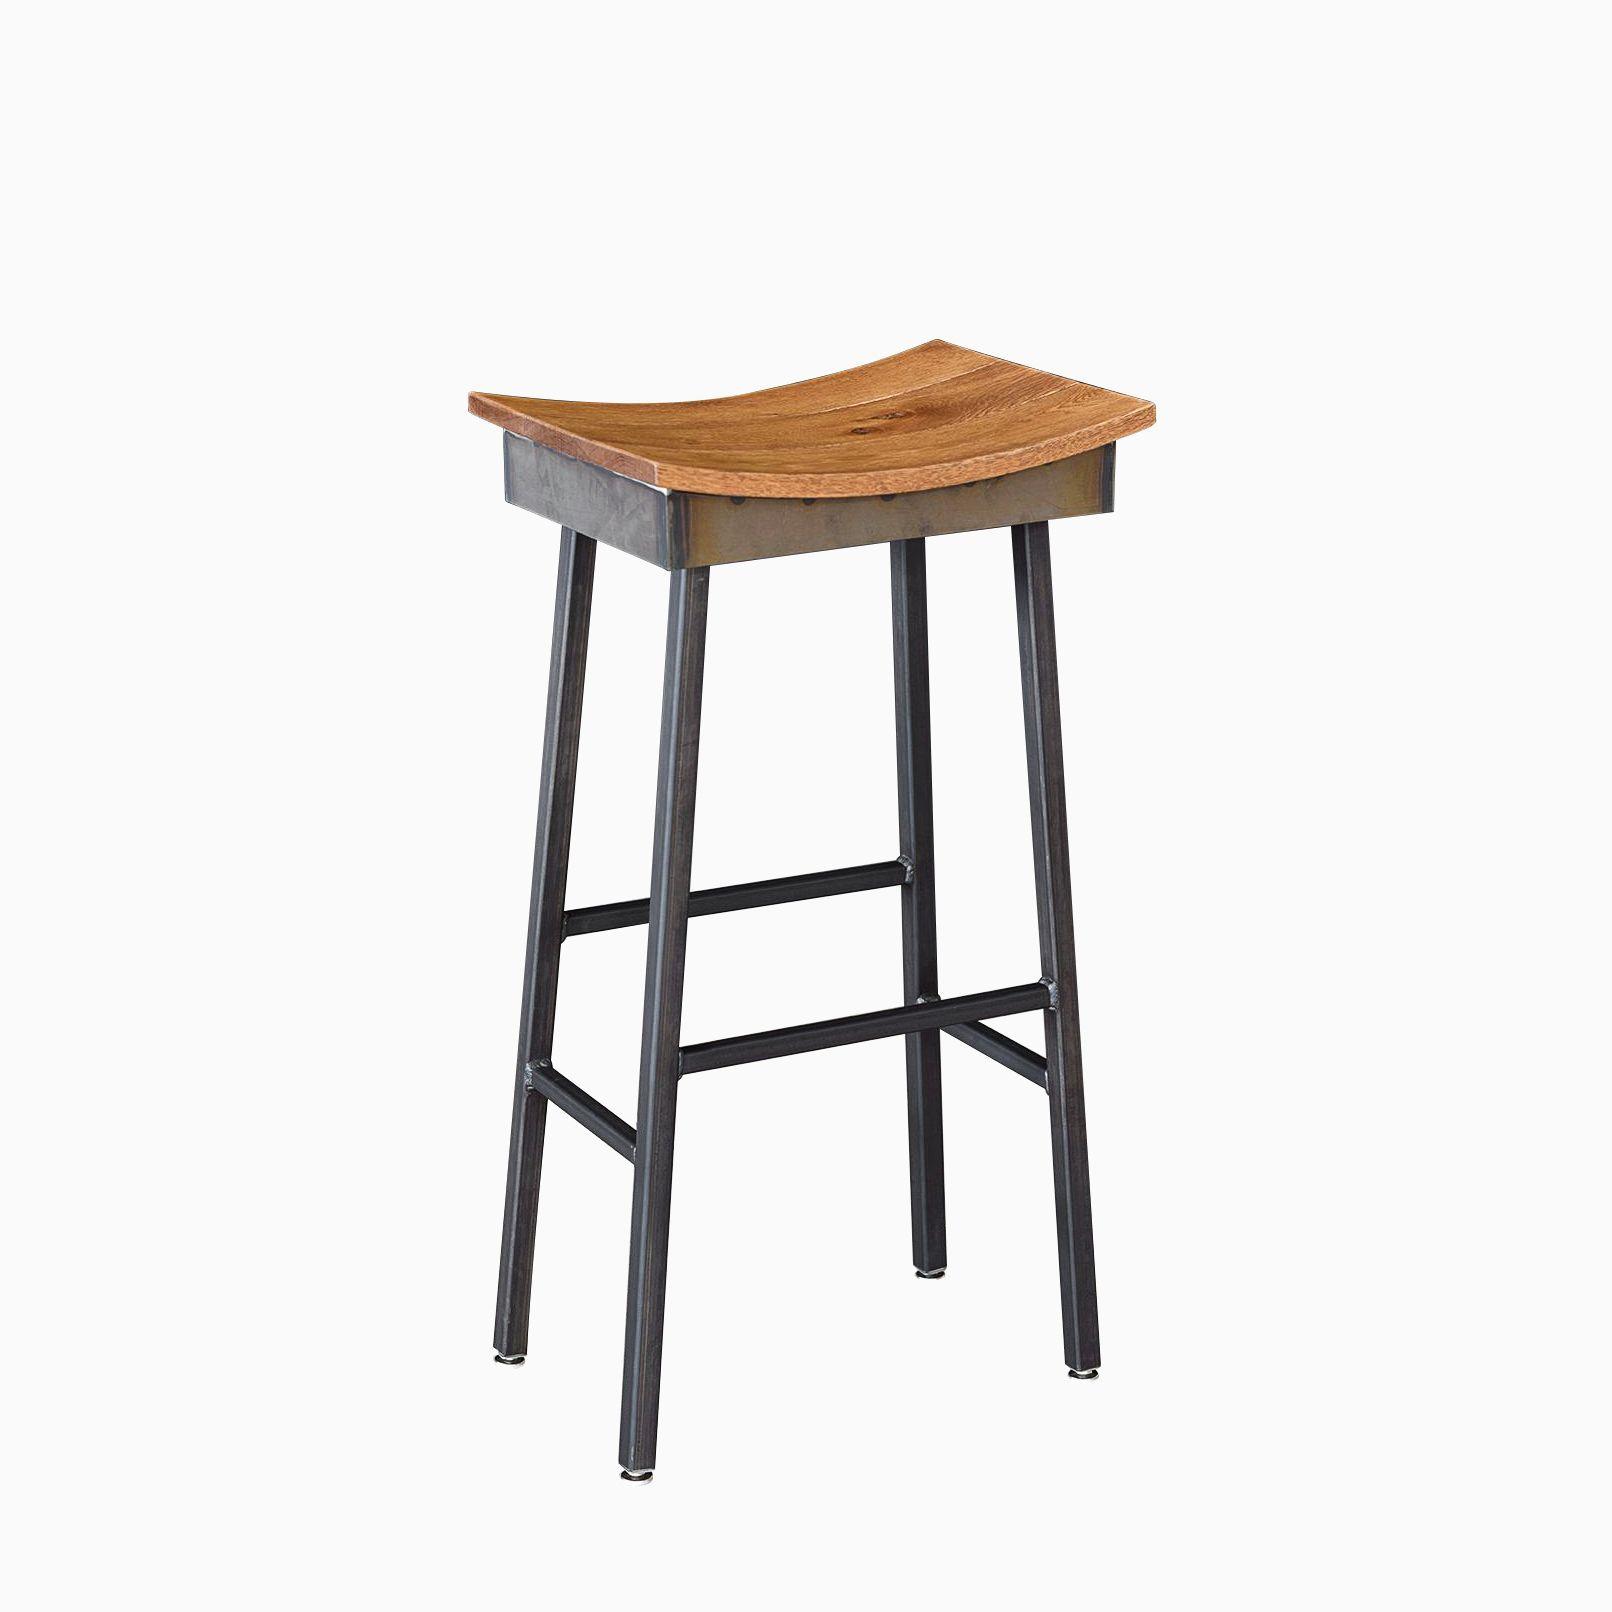 Custom Made Industrial Modern Saddle Stool Chairs